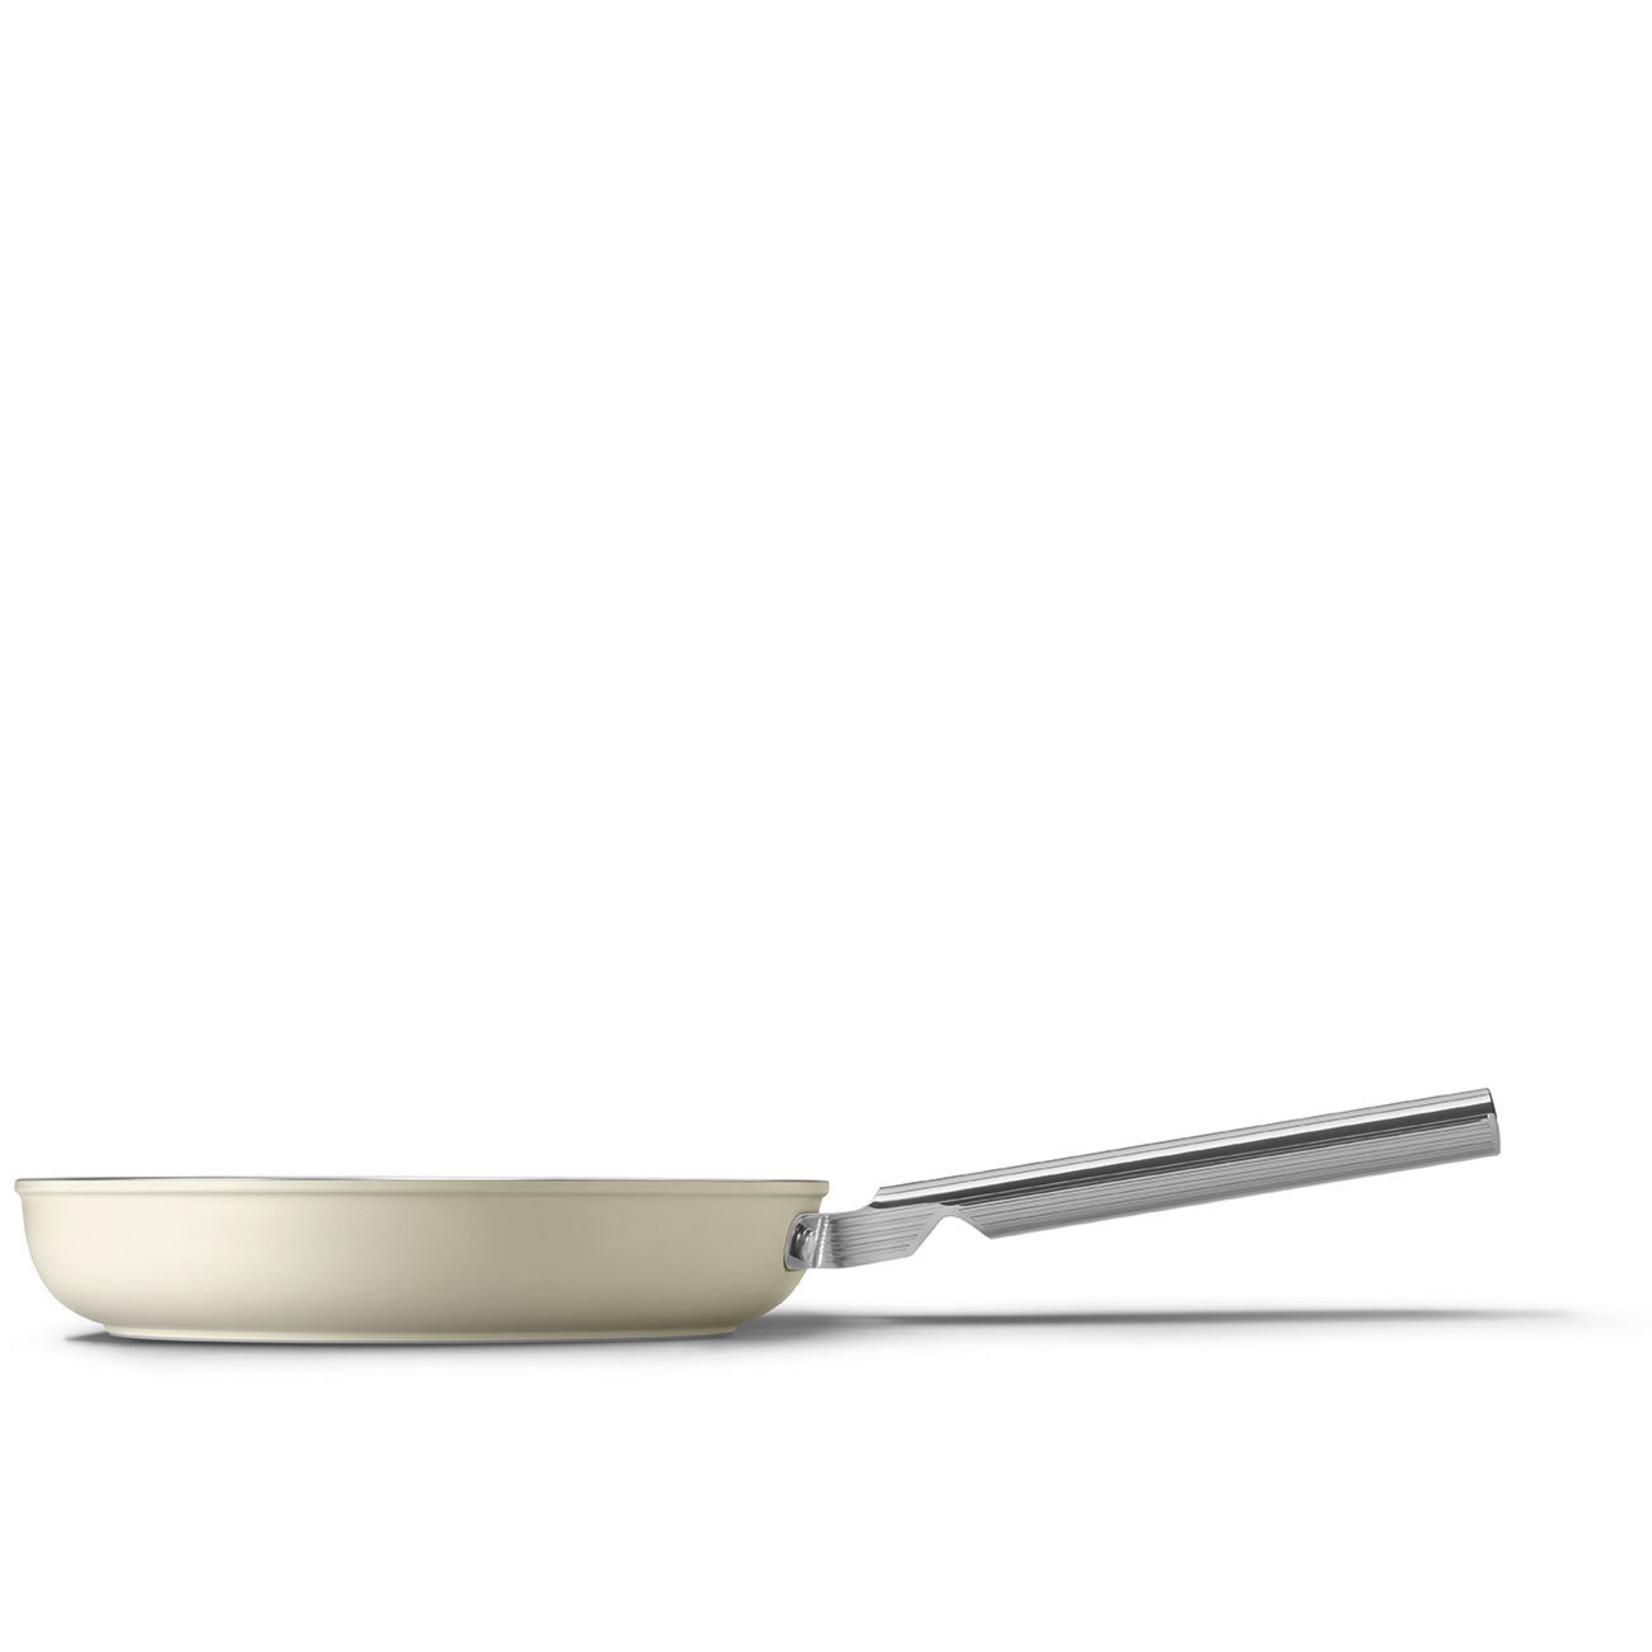 Smeg SMEG Koekenpan 24 cm, anti-aanbaklaag, crème mat